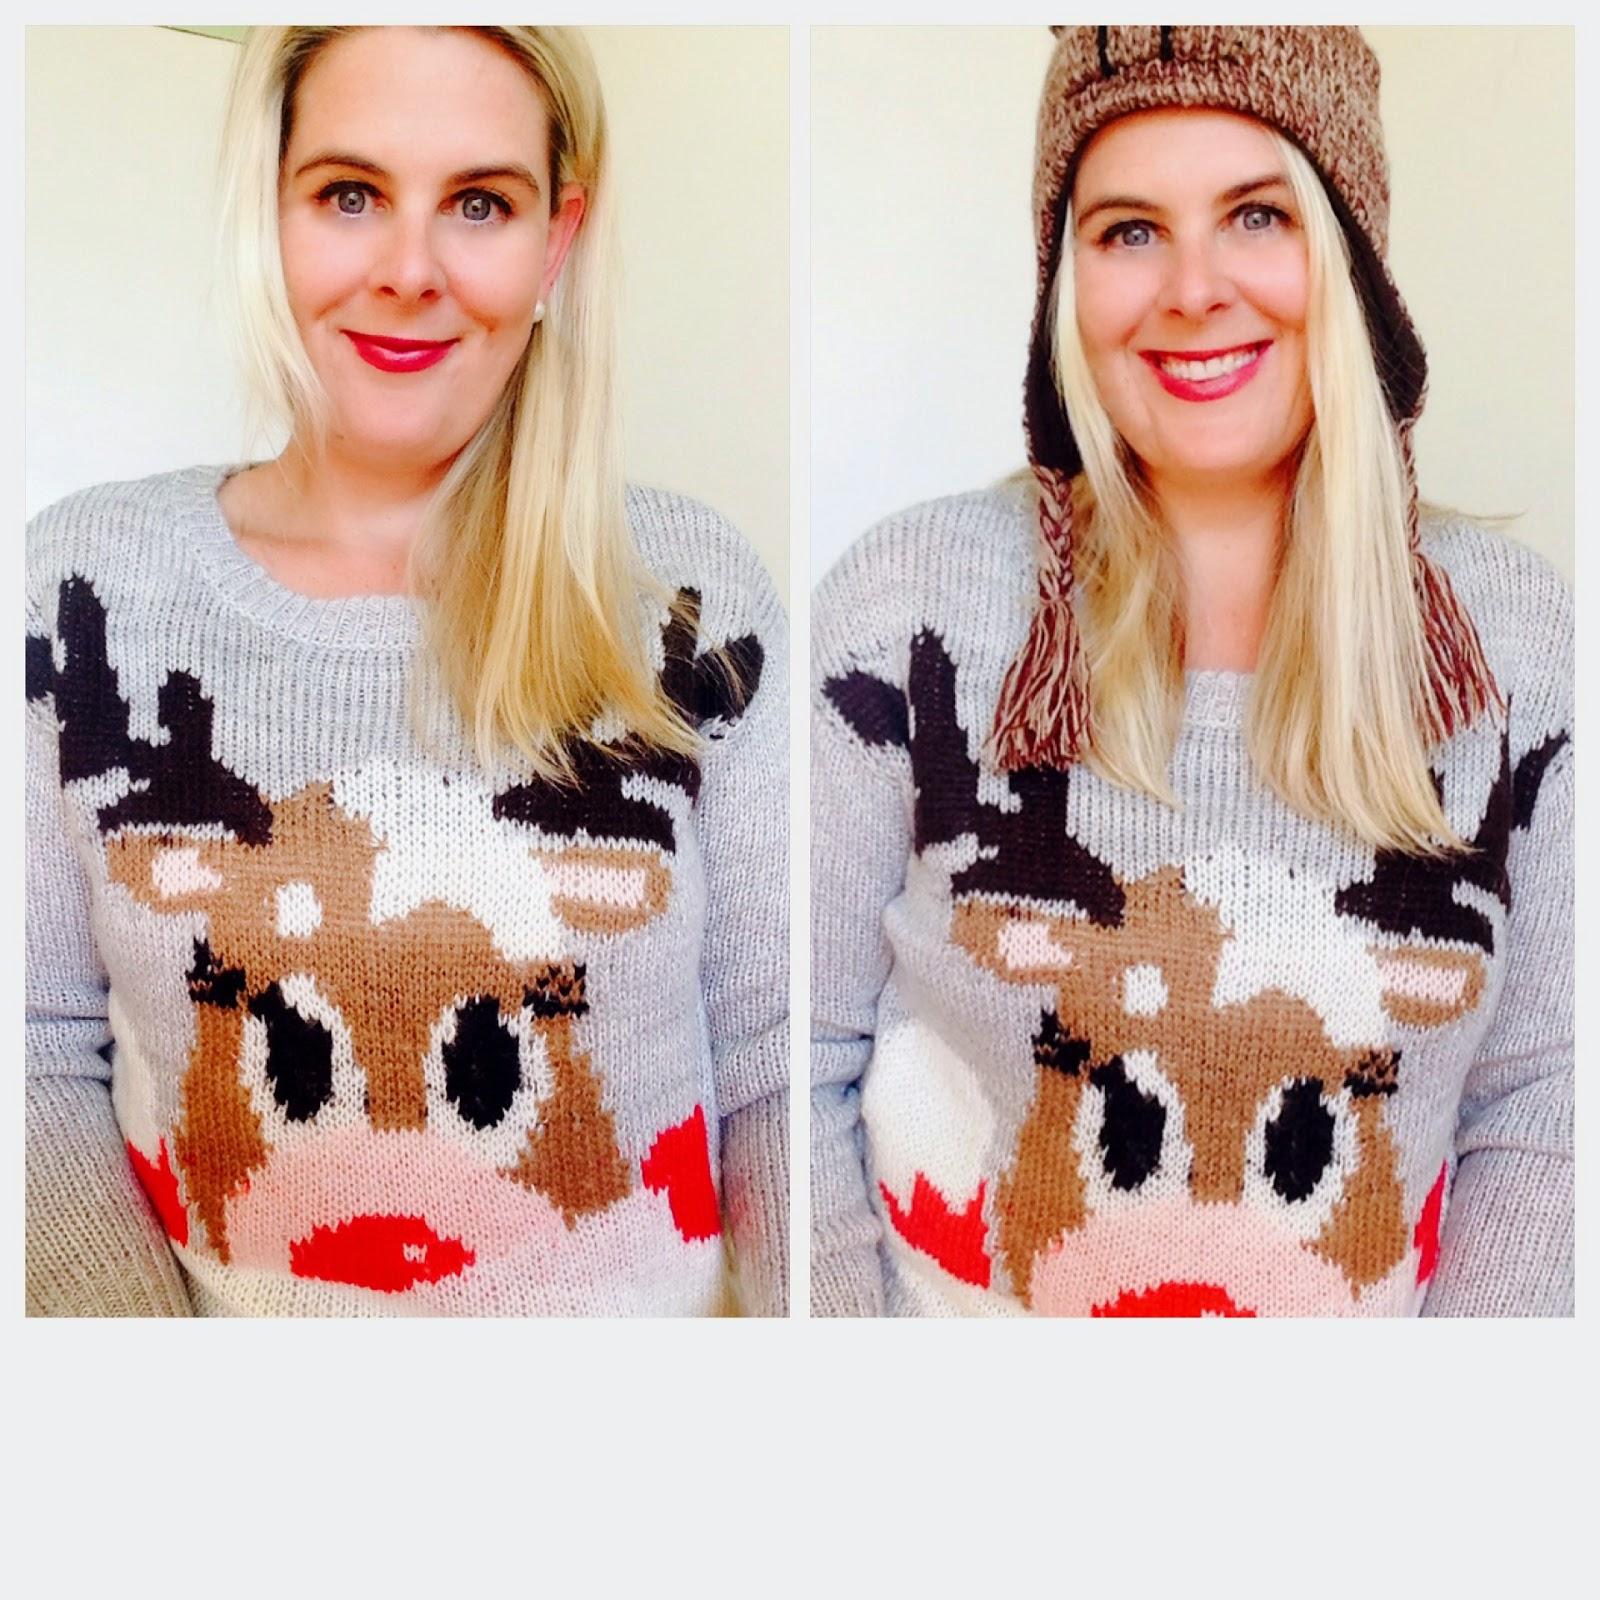 Yummo Mummo   The Xmas sweater – now stylish! x